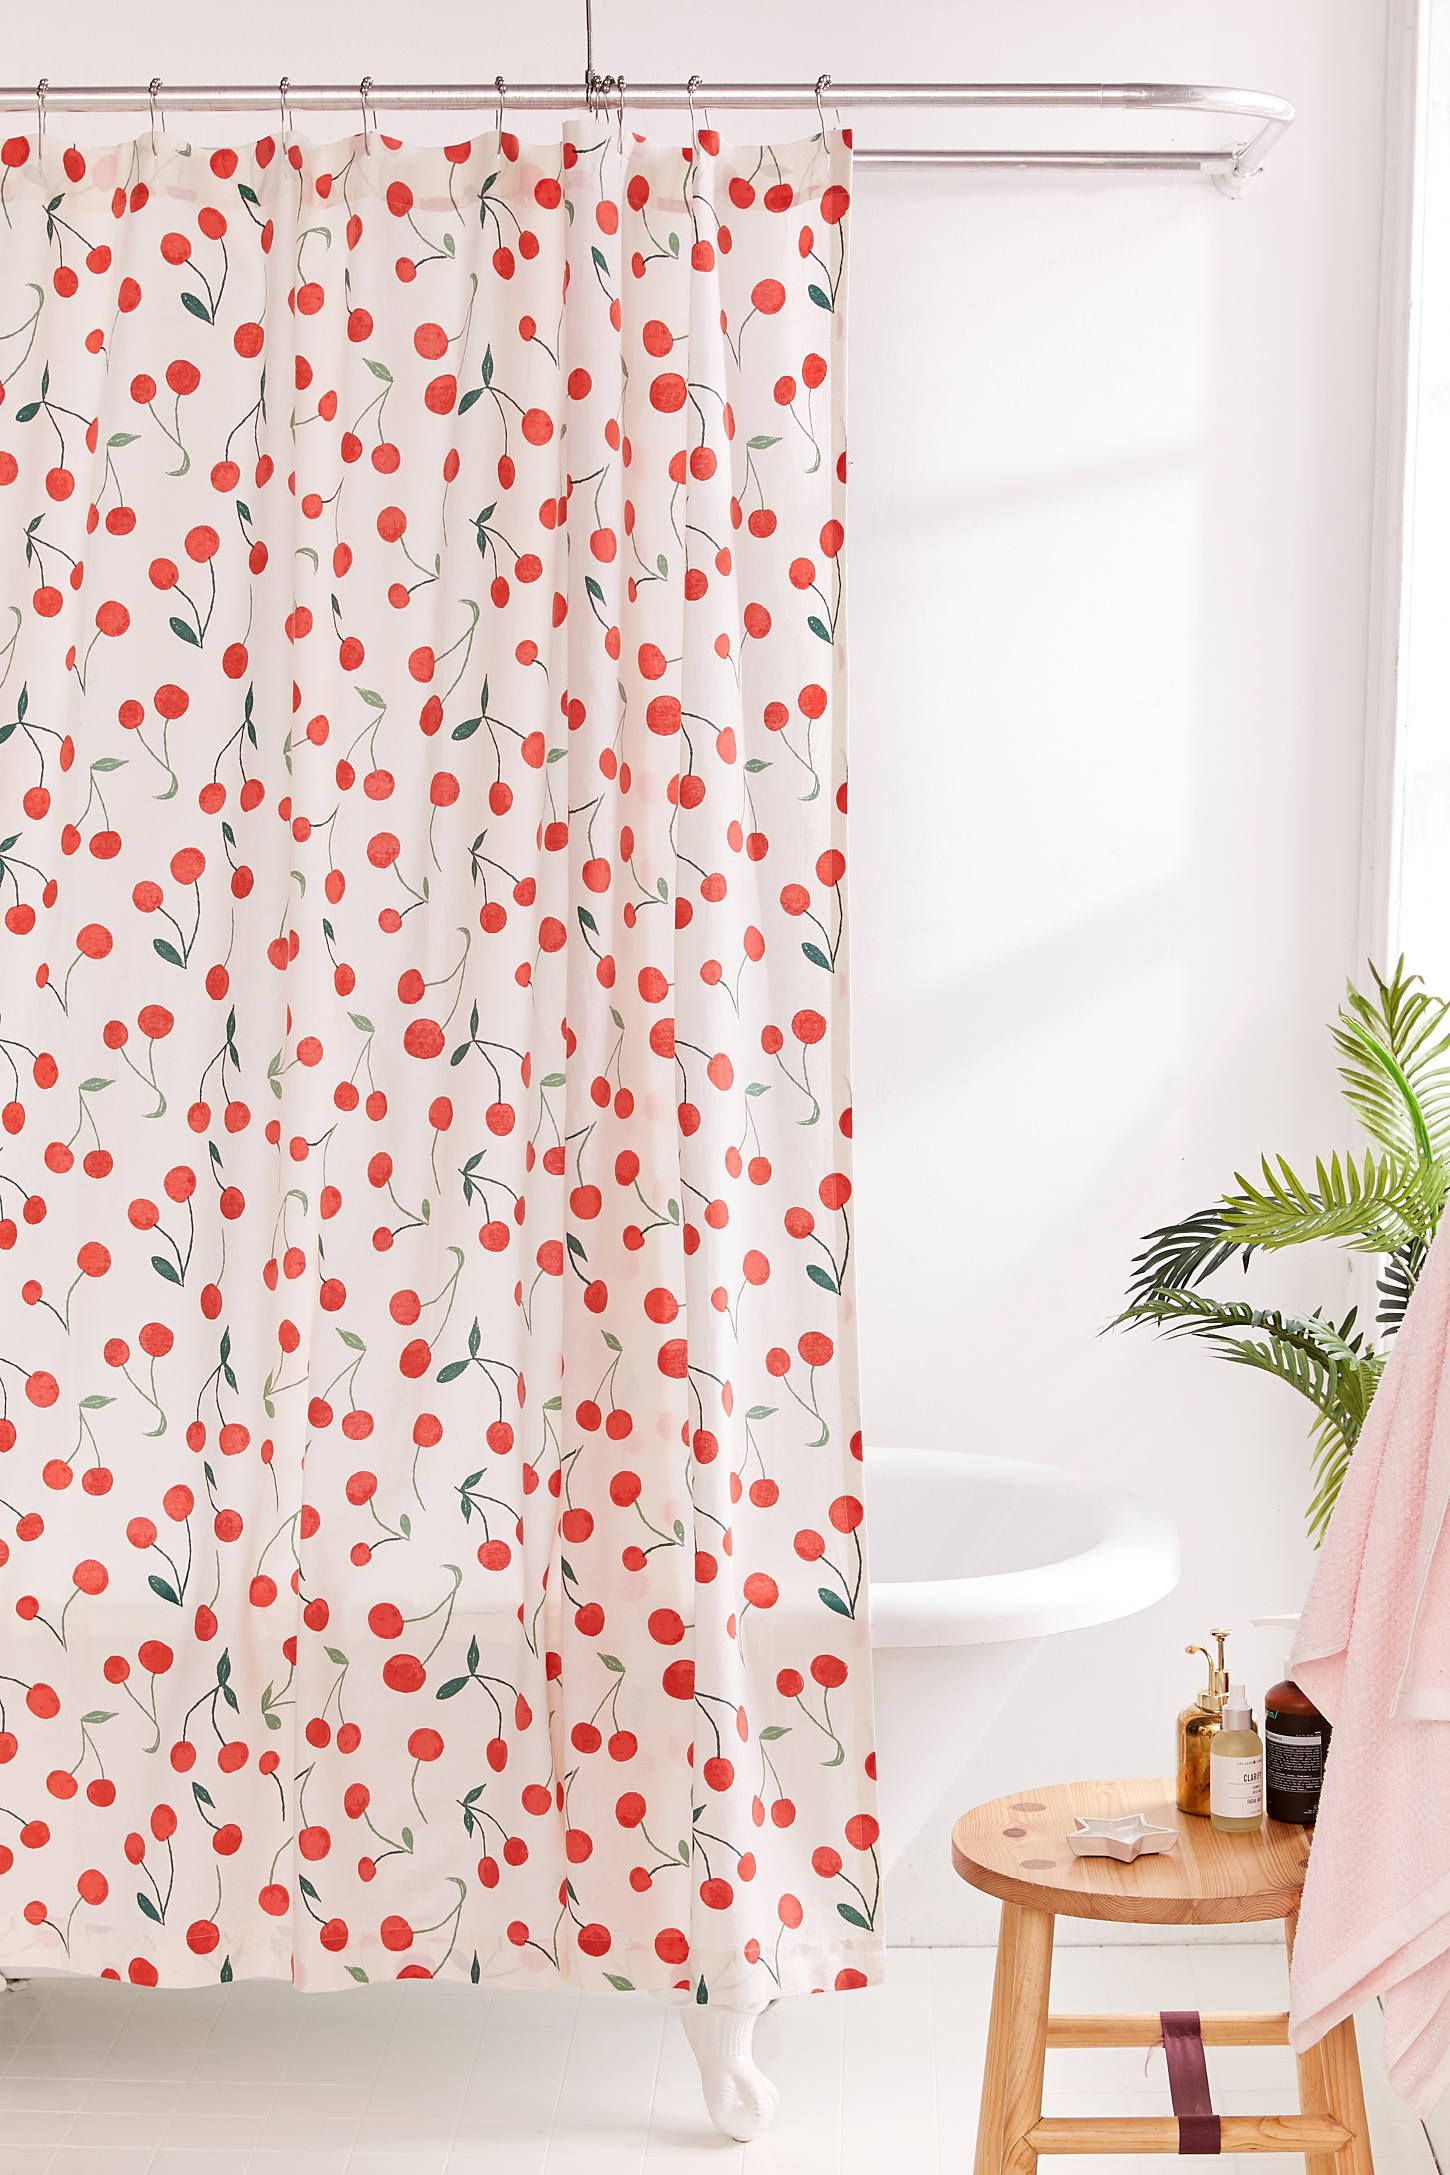 Little Loves Seashell Sunglasses And More Shower Curtain Decor